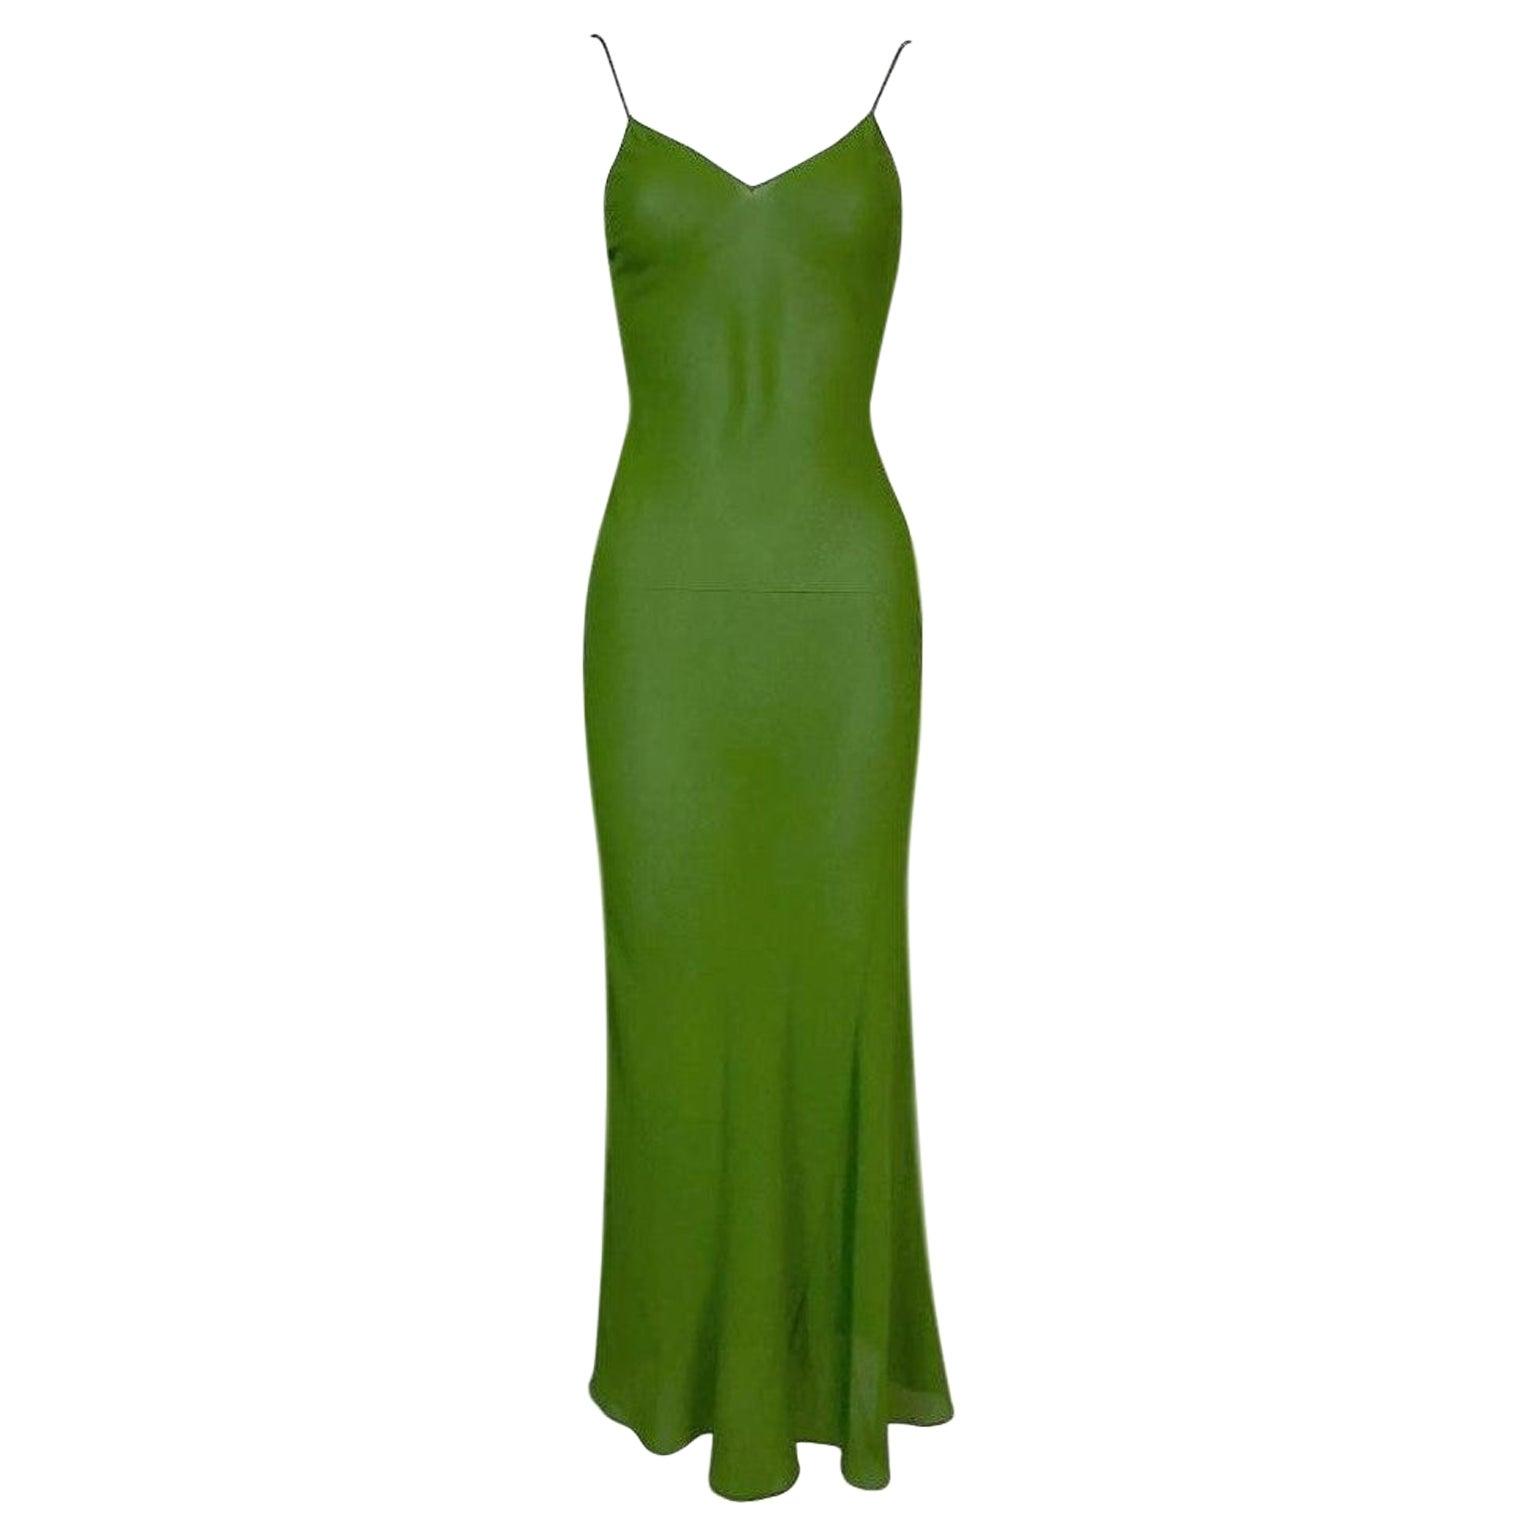 F/W 1999 John Galliano Sheer Green Silk Maxi Slip Dress